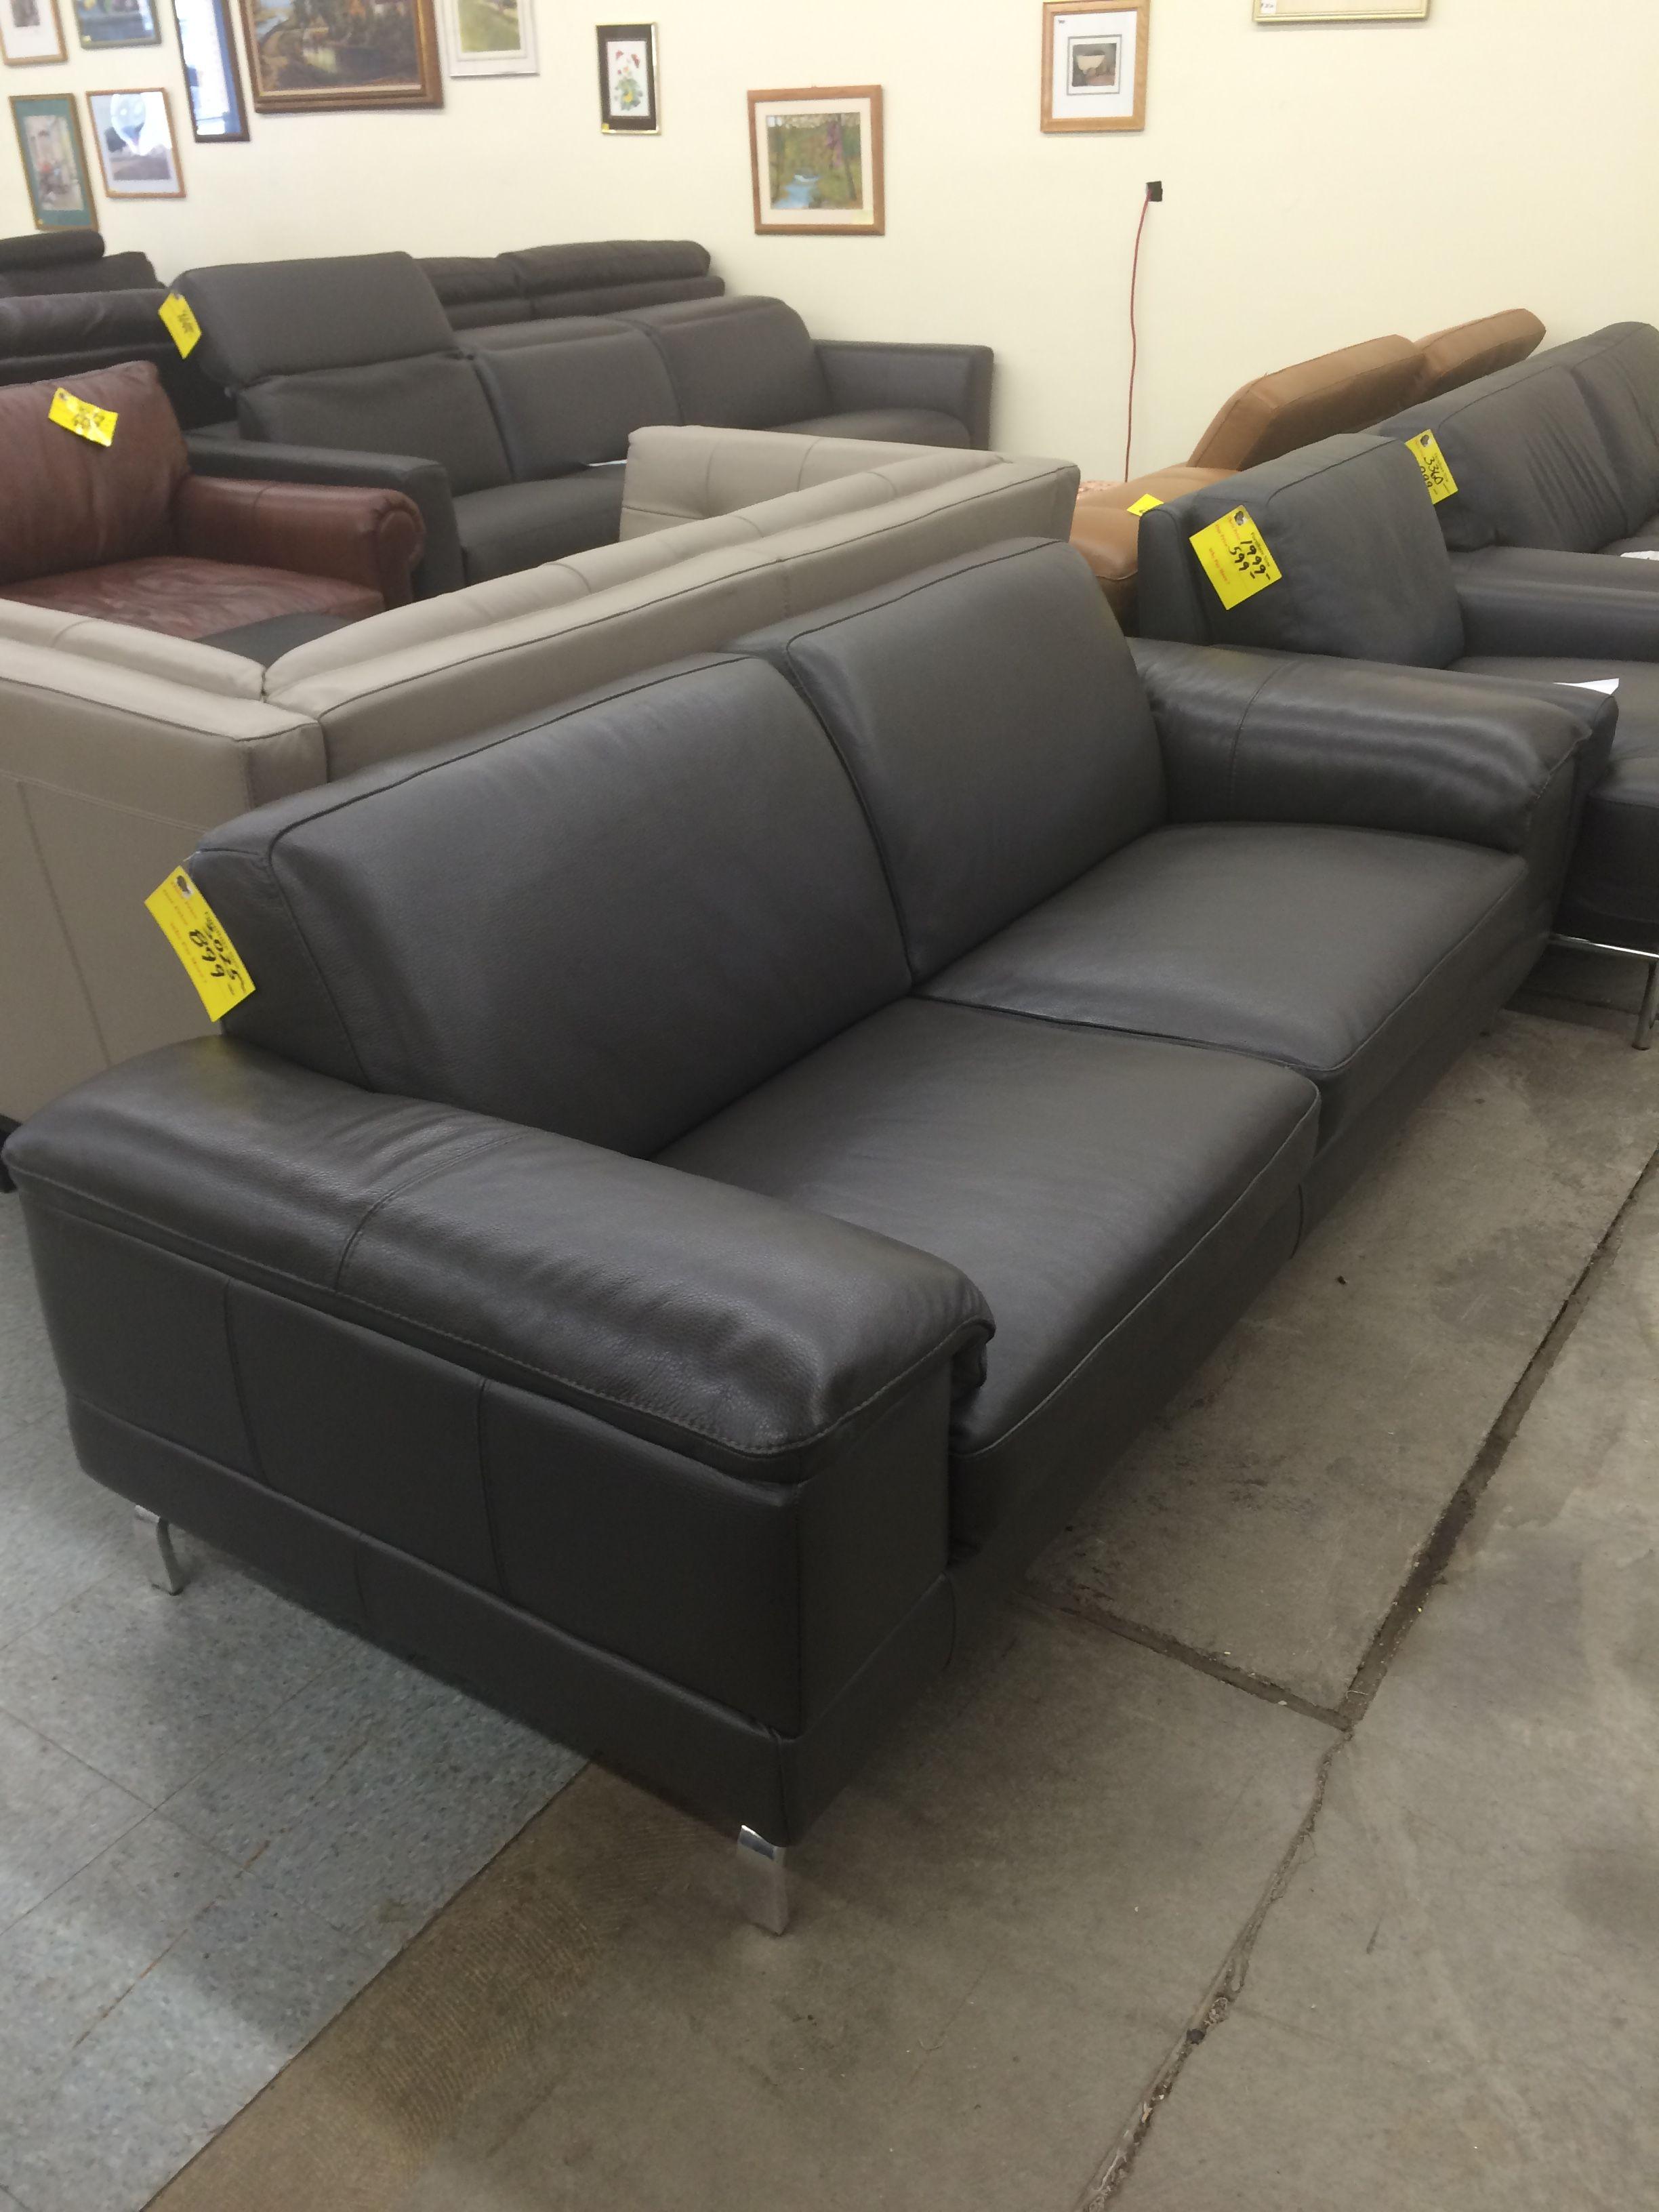 Nicoletti Lipari Grey Italian Leather Sofa Chaise For Small Rooms  Home Decor 88